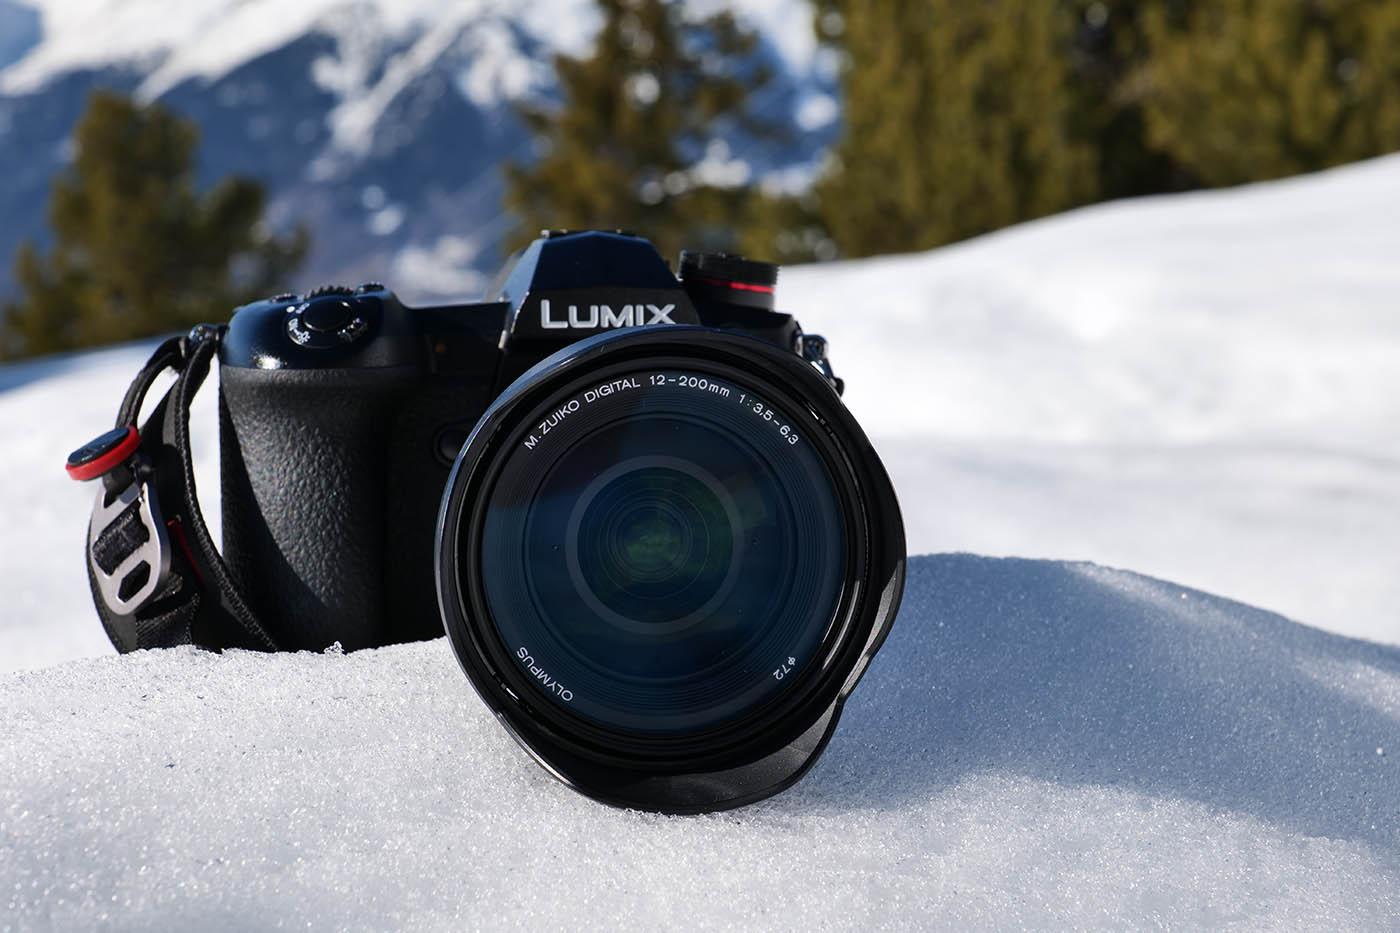 Olympus 12-200 mm + Lumix Panasonic G9